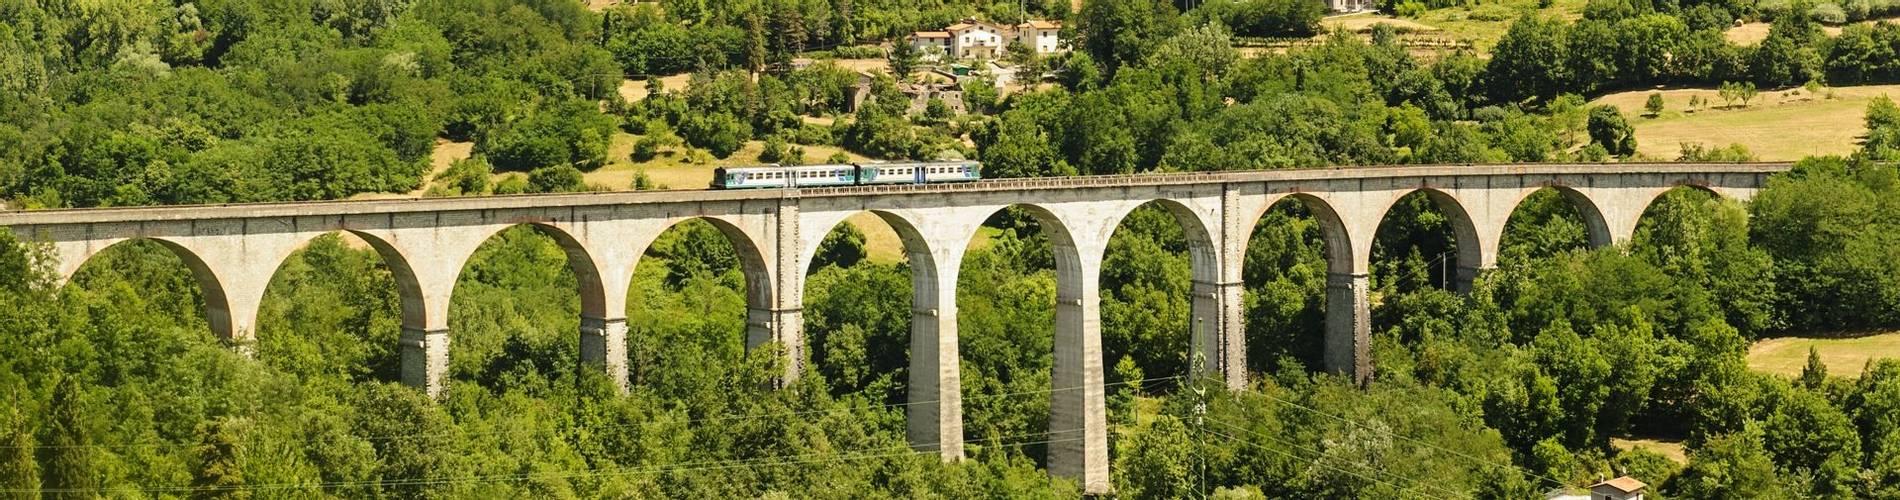 Train Tuscany.jpg